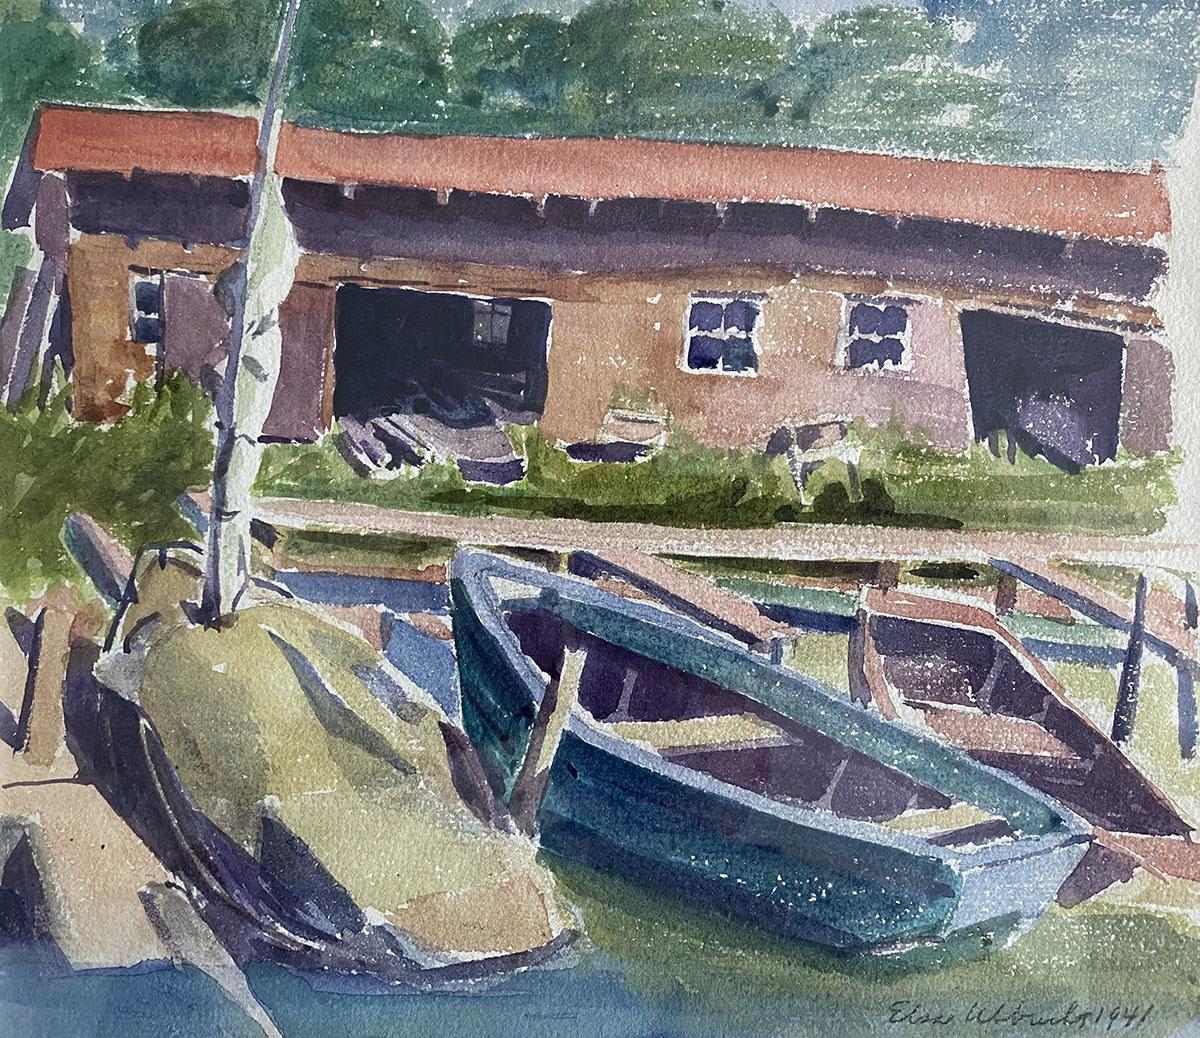 Boats at Rest (Saugat... by Ms. Elsa Ulbricht - Masterpiece Online